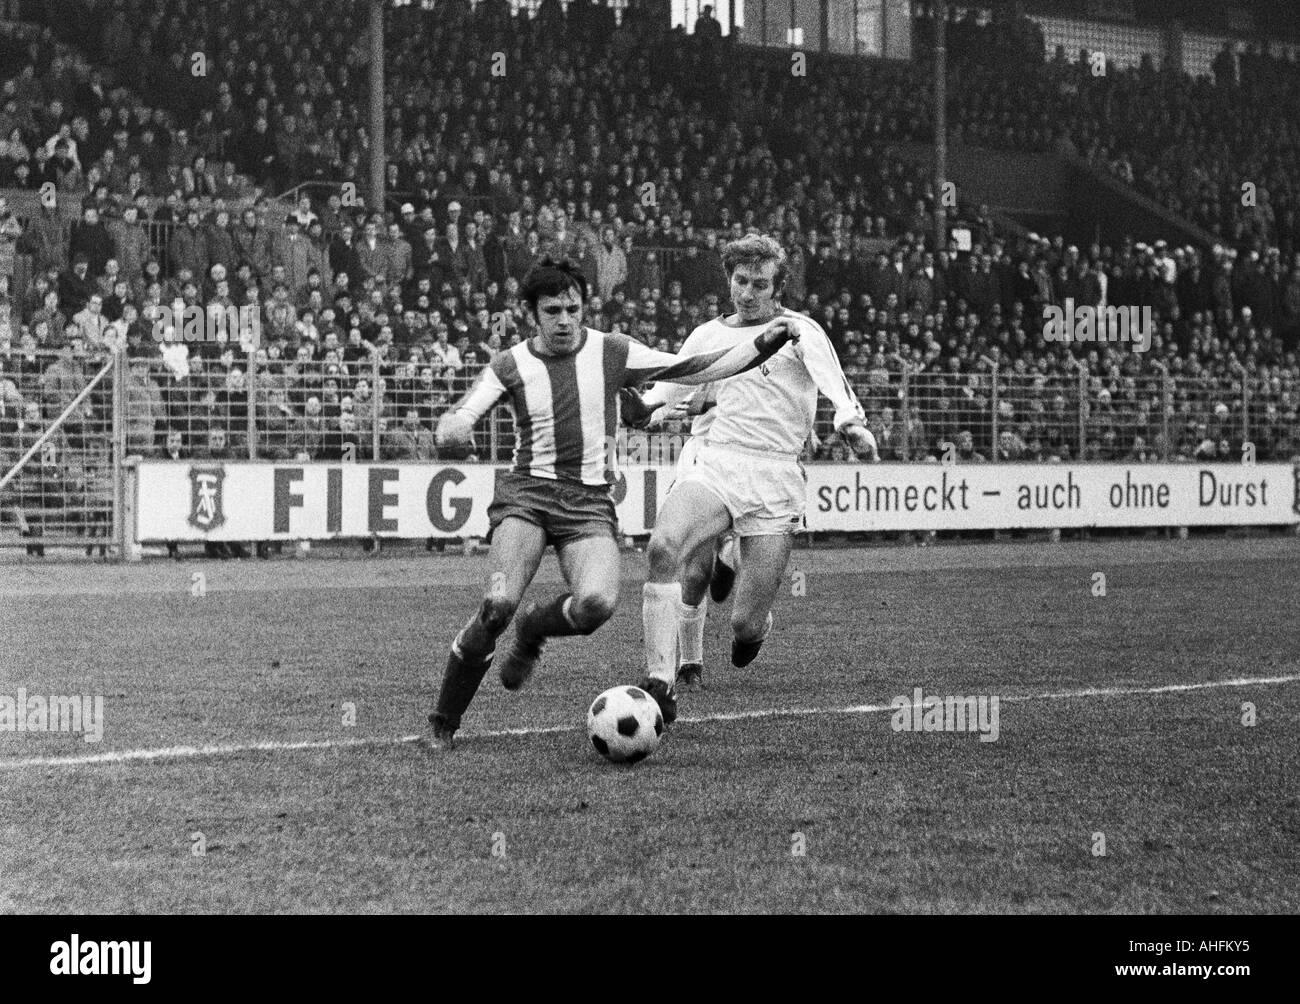 football, Bundesliga, 1971/1972, VfL Bochum versus 1. FC Kaiserslautern 4:2, Stadium at the Castroper Strasse in Bochum, scene of the match, duel between Wolfgang Seel (FCK) left and Manfred Ruesing (Bochum) - Stock Image